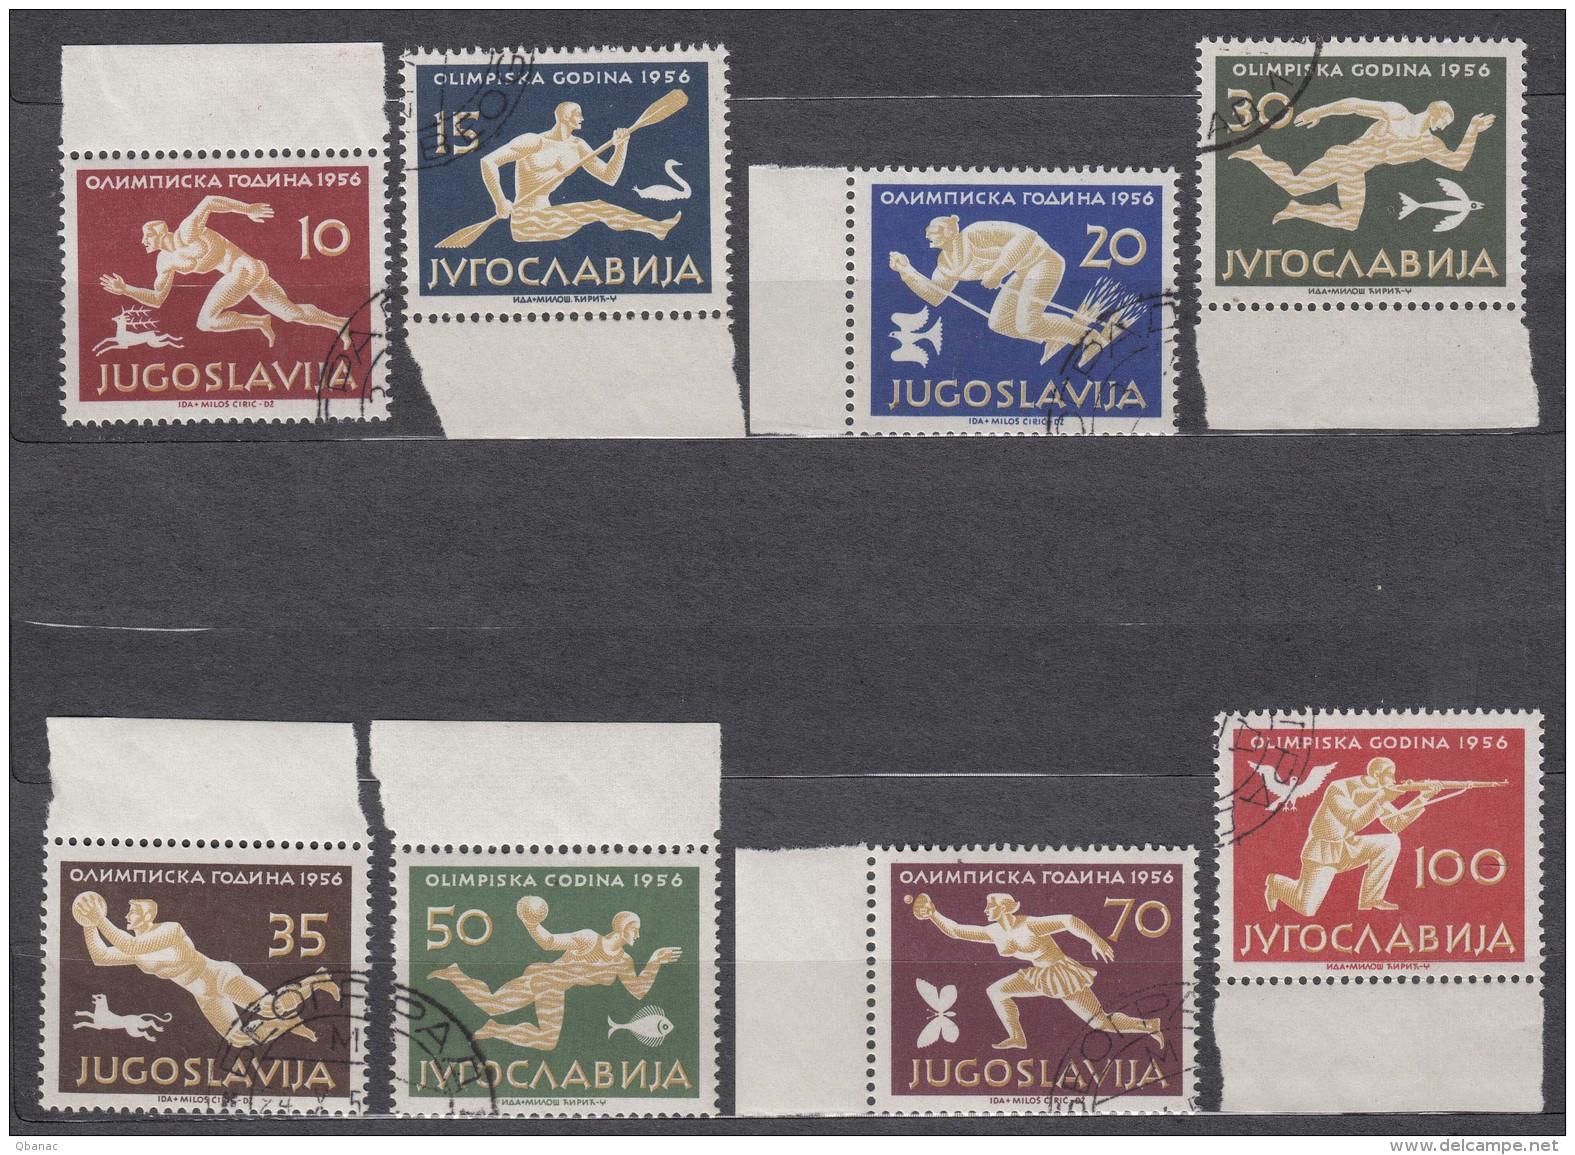 Yugoslavia Republic 1956 Sport Olympic Games Melbourn Mi#804-811 Used - 1945-1992 Socialistische Federale Republiek Joegoslavië